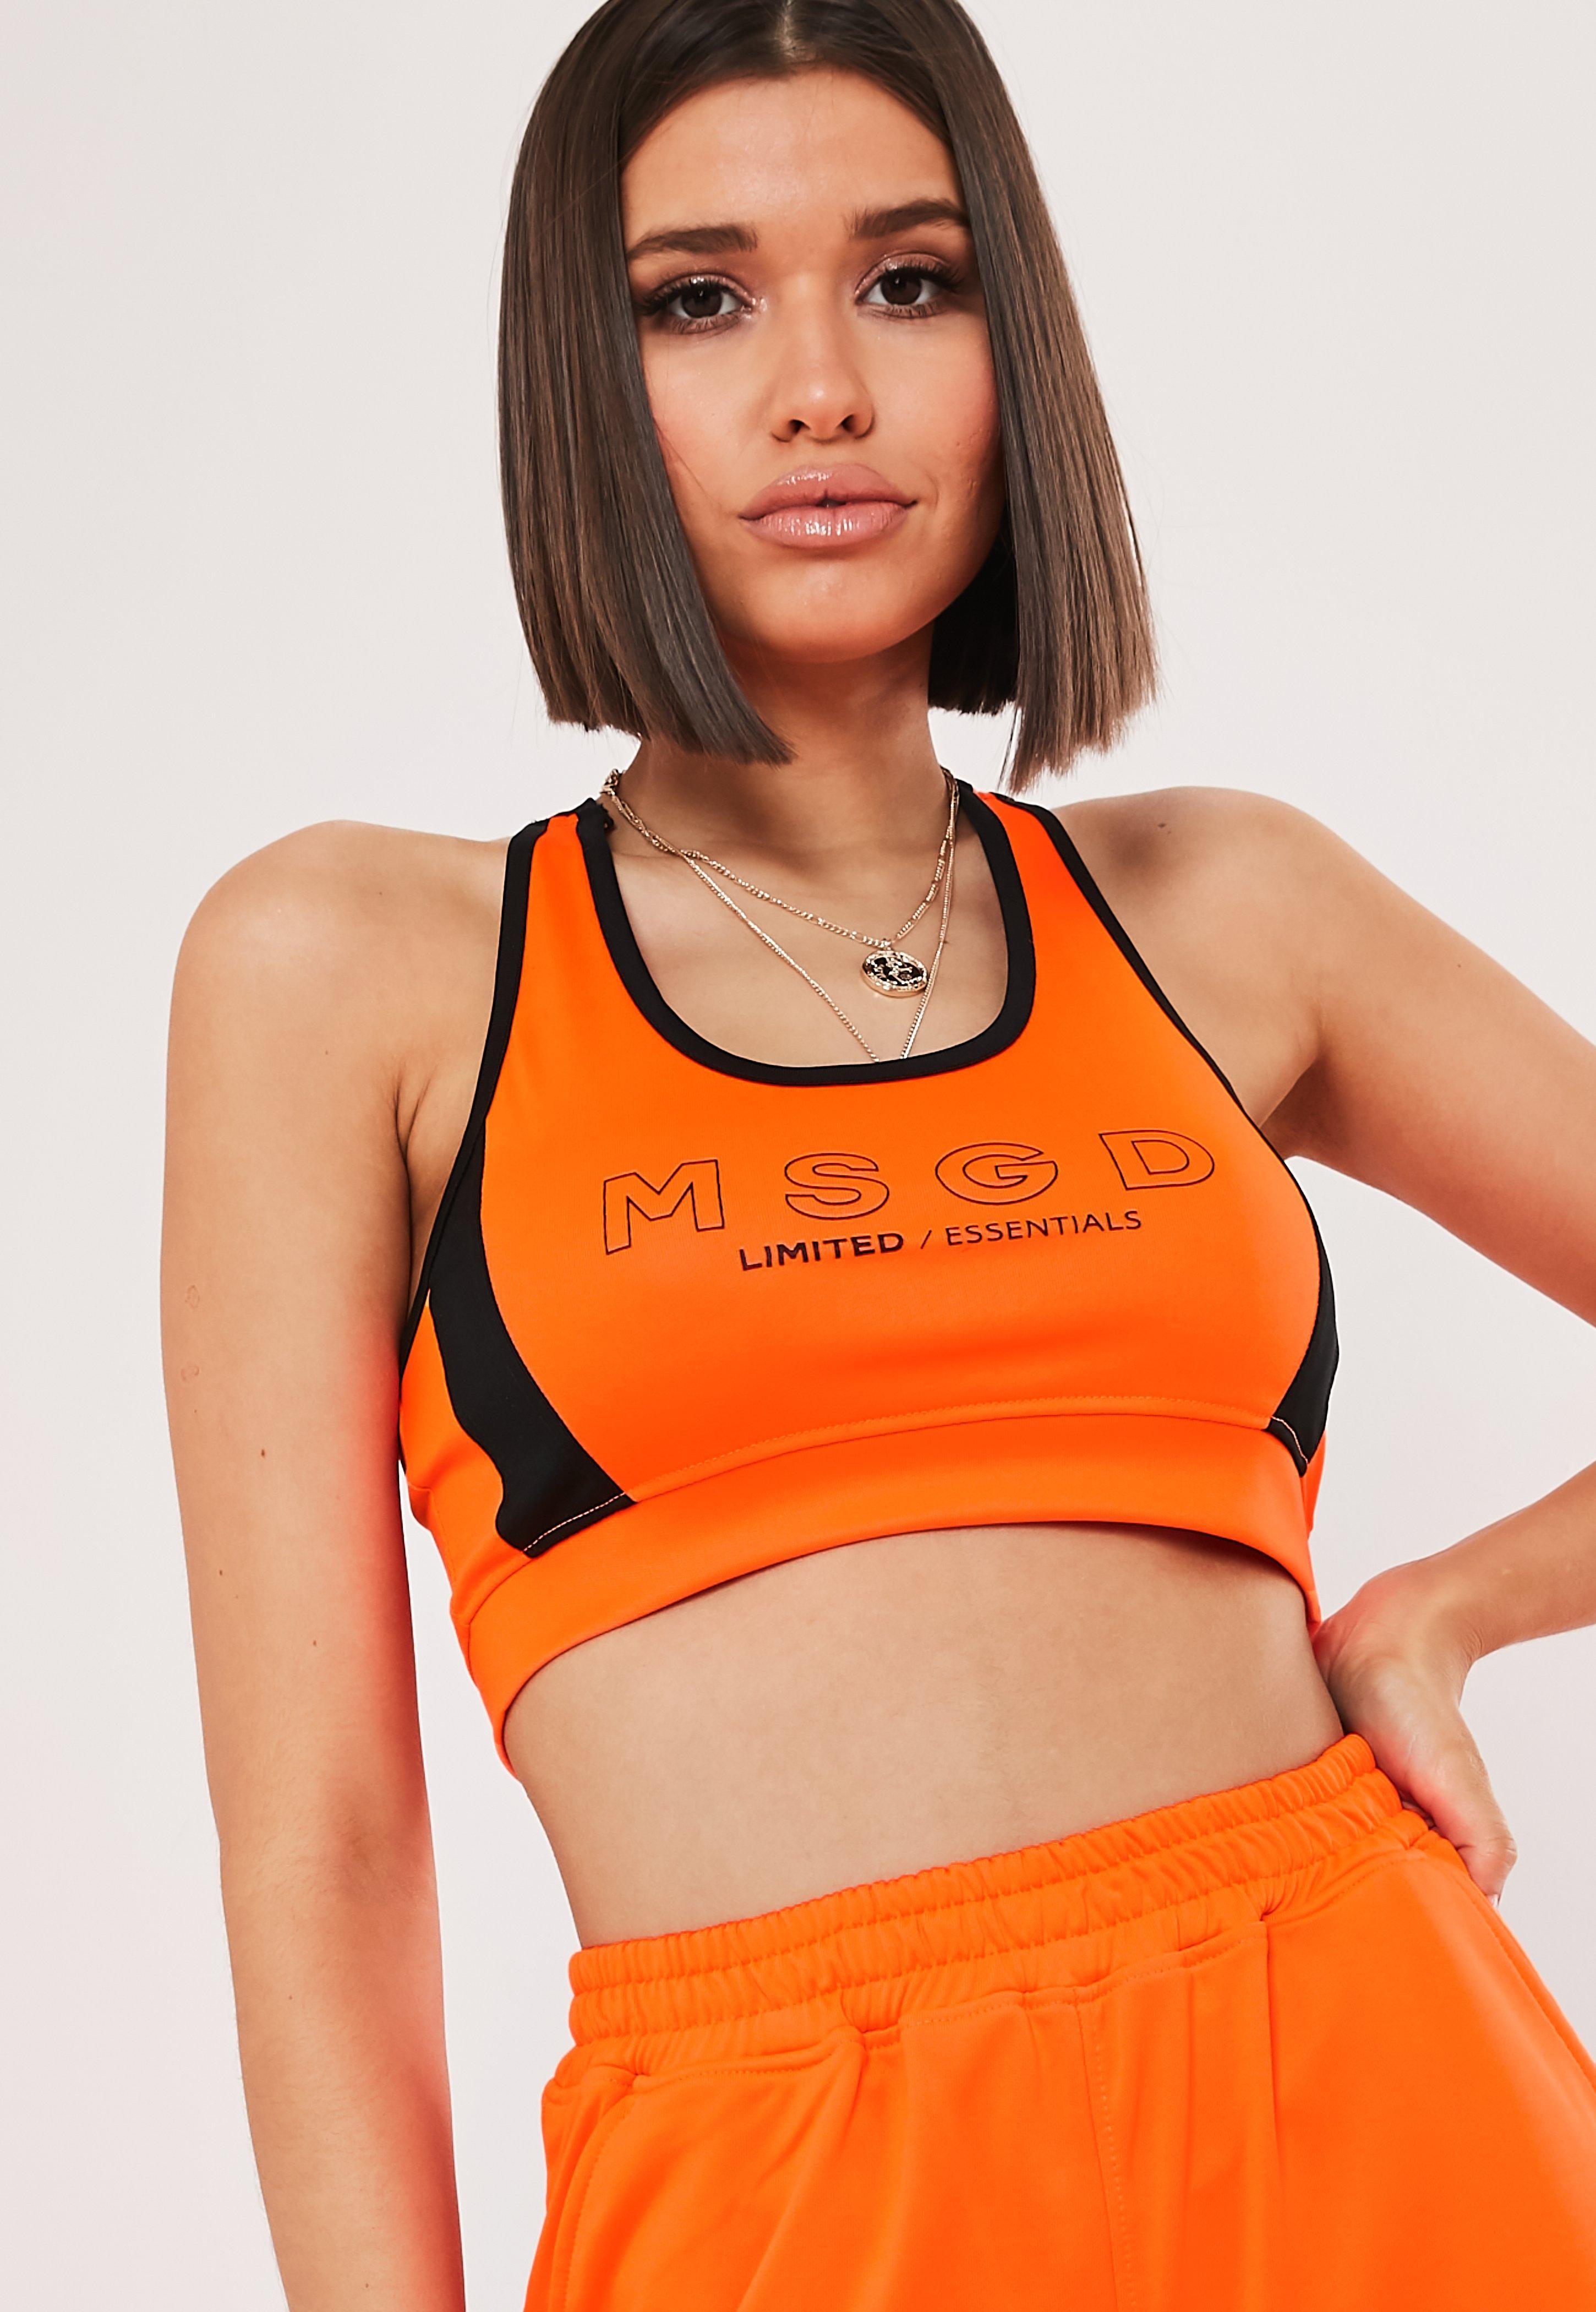 d4917c898c2 Women's Sportswear & Gym Clothes UK - Missguided Active